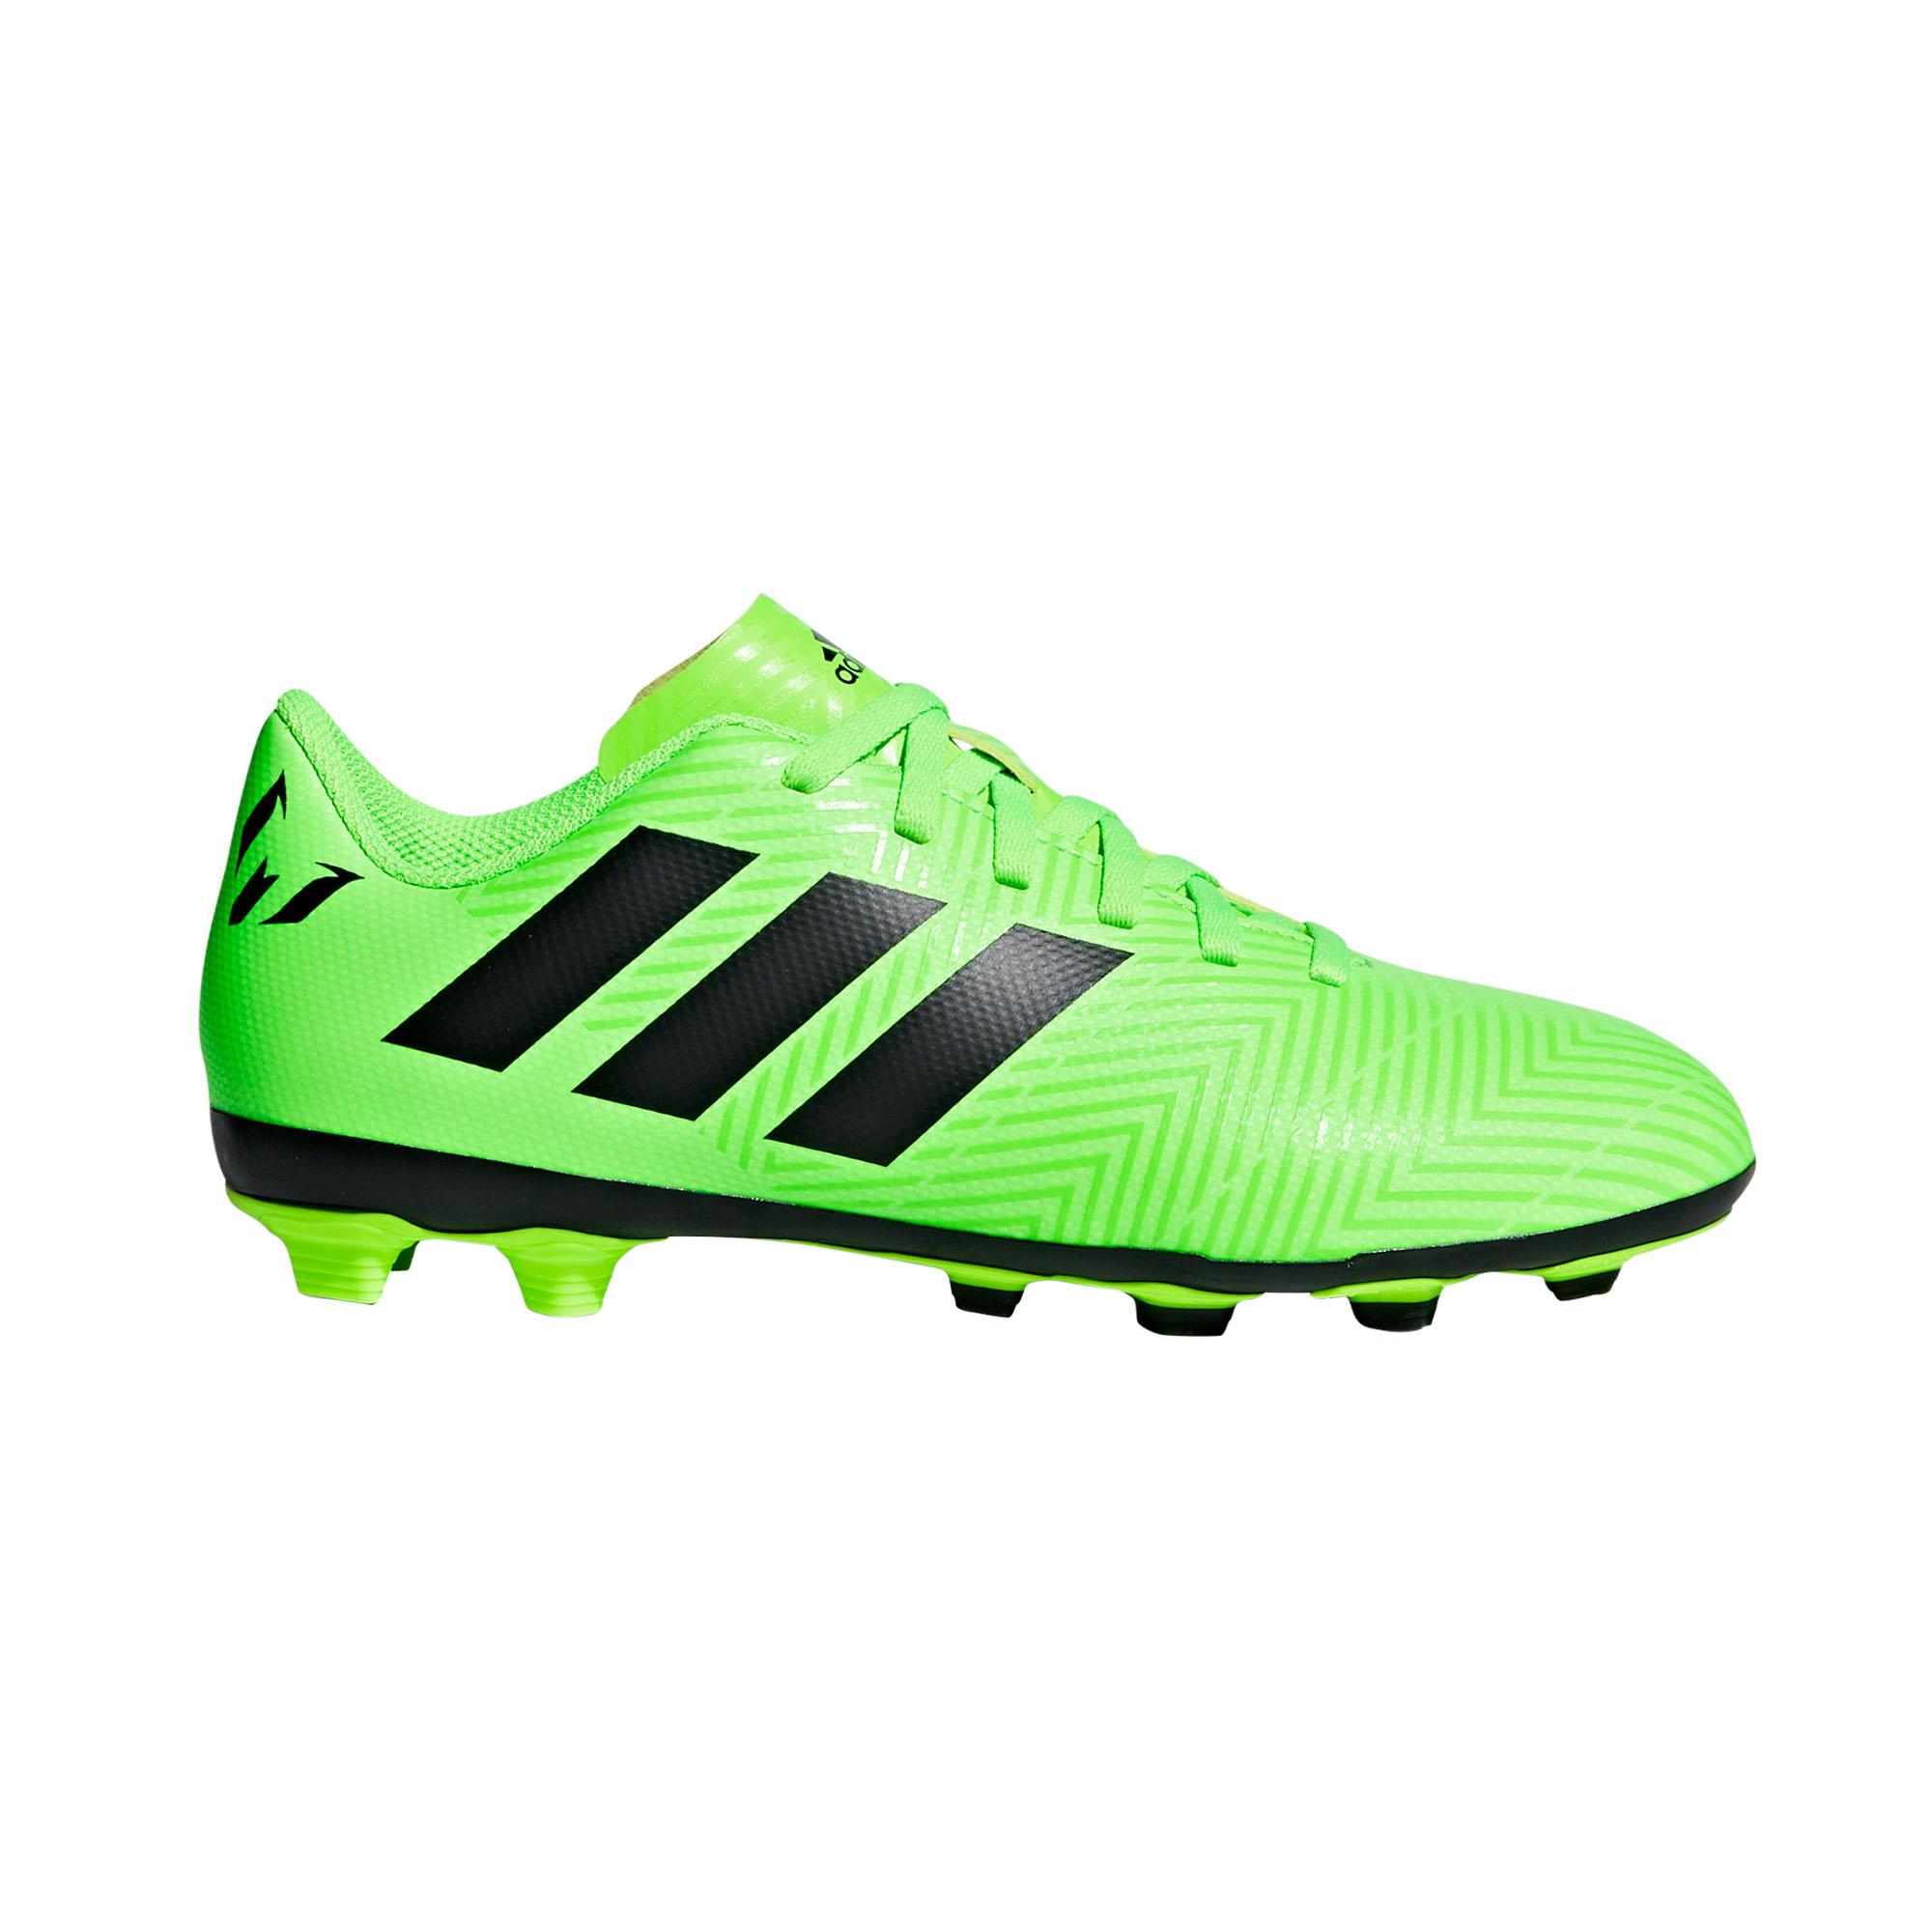 adidas Nemeziz Messi 18.4 FG Firm Ground Kids Football Soccer Boot Energy  Mode 1877c4ef59a97